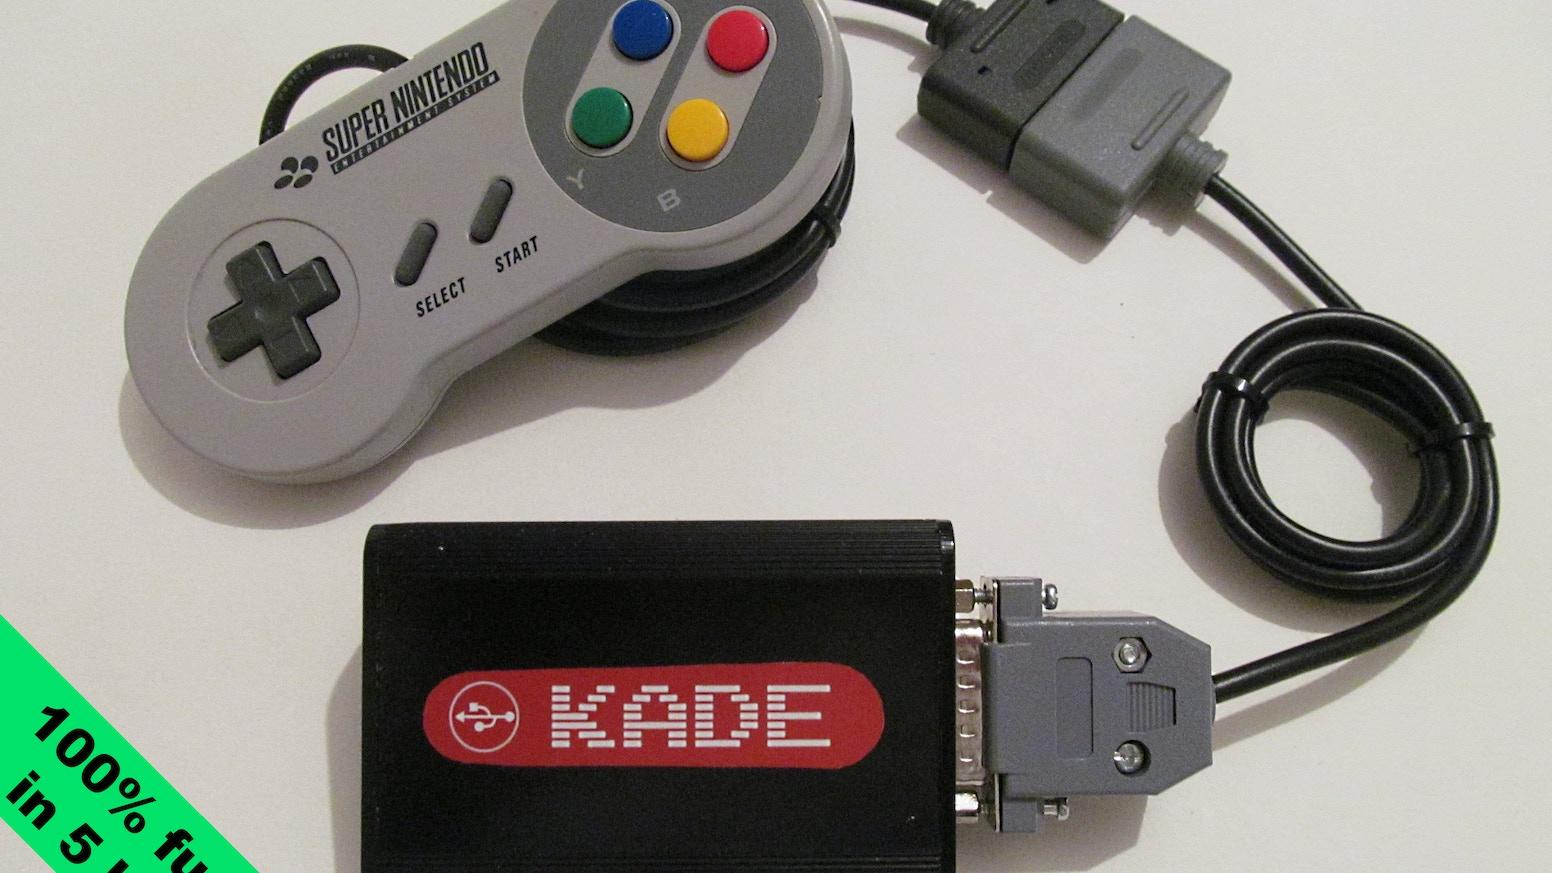 Kade Miniconsole A Smart Open Source Retro Gaming Device By Jon Crossover Cable Wiring Diagram For Xbox Wilson Kevin Mackett Bruno Freitas Kickstarter